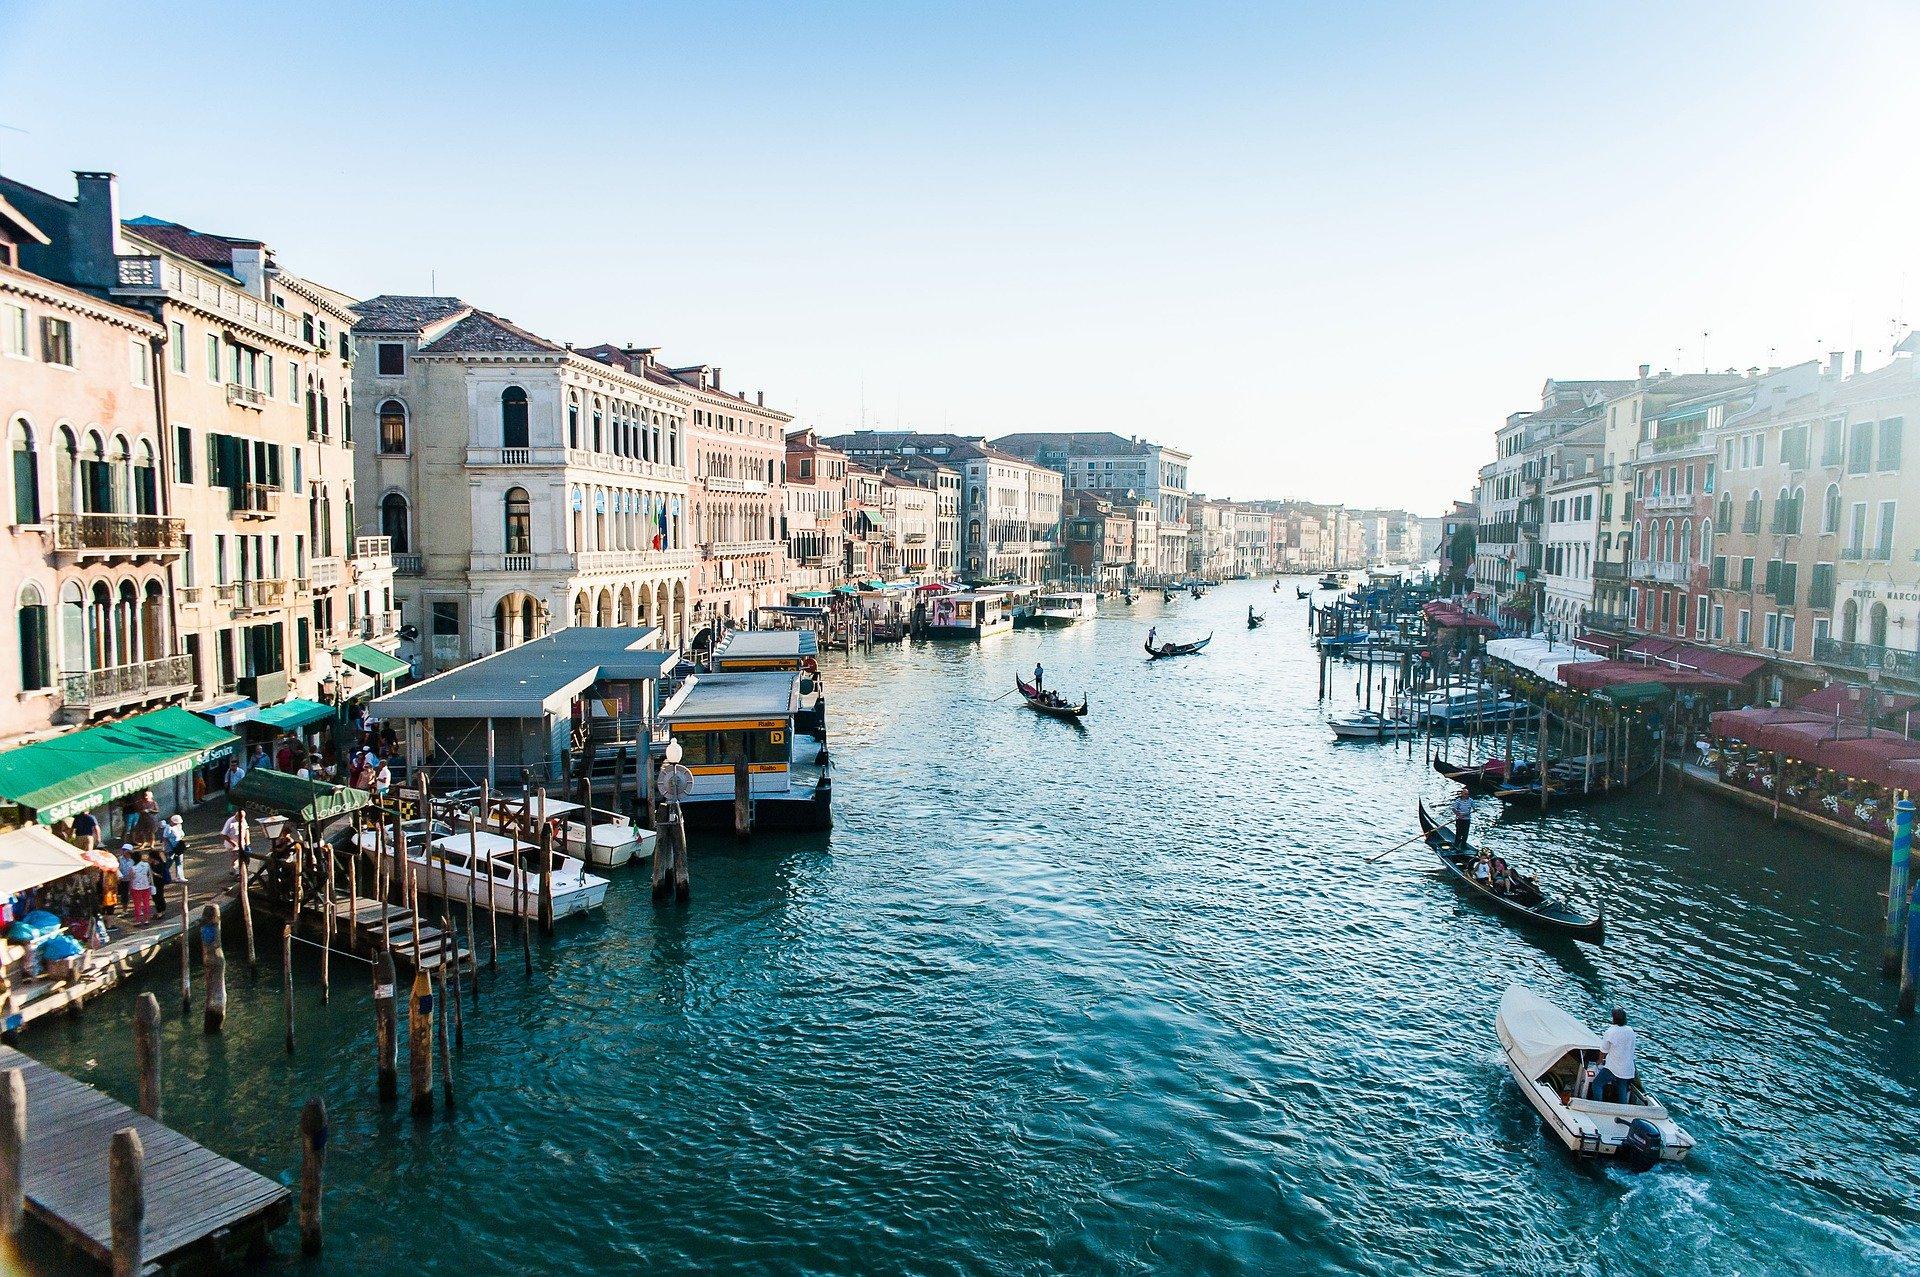 regione veneto, Regione Veneto: a rischio import-export in Medioriente, BorsaMagazine.it, BorsaMagazine.it